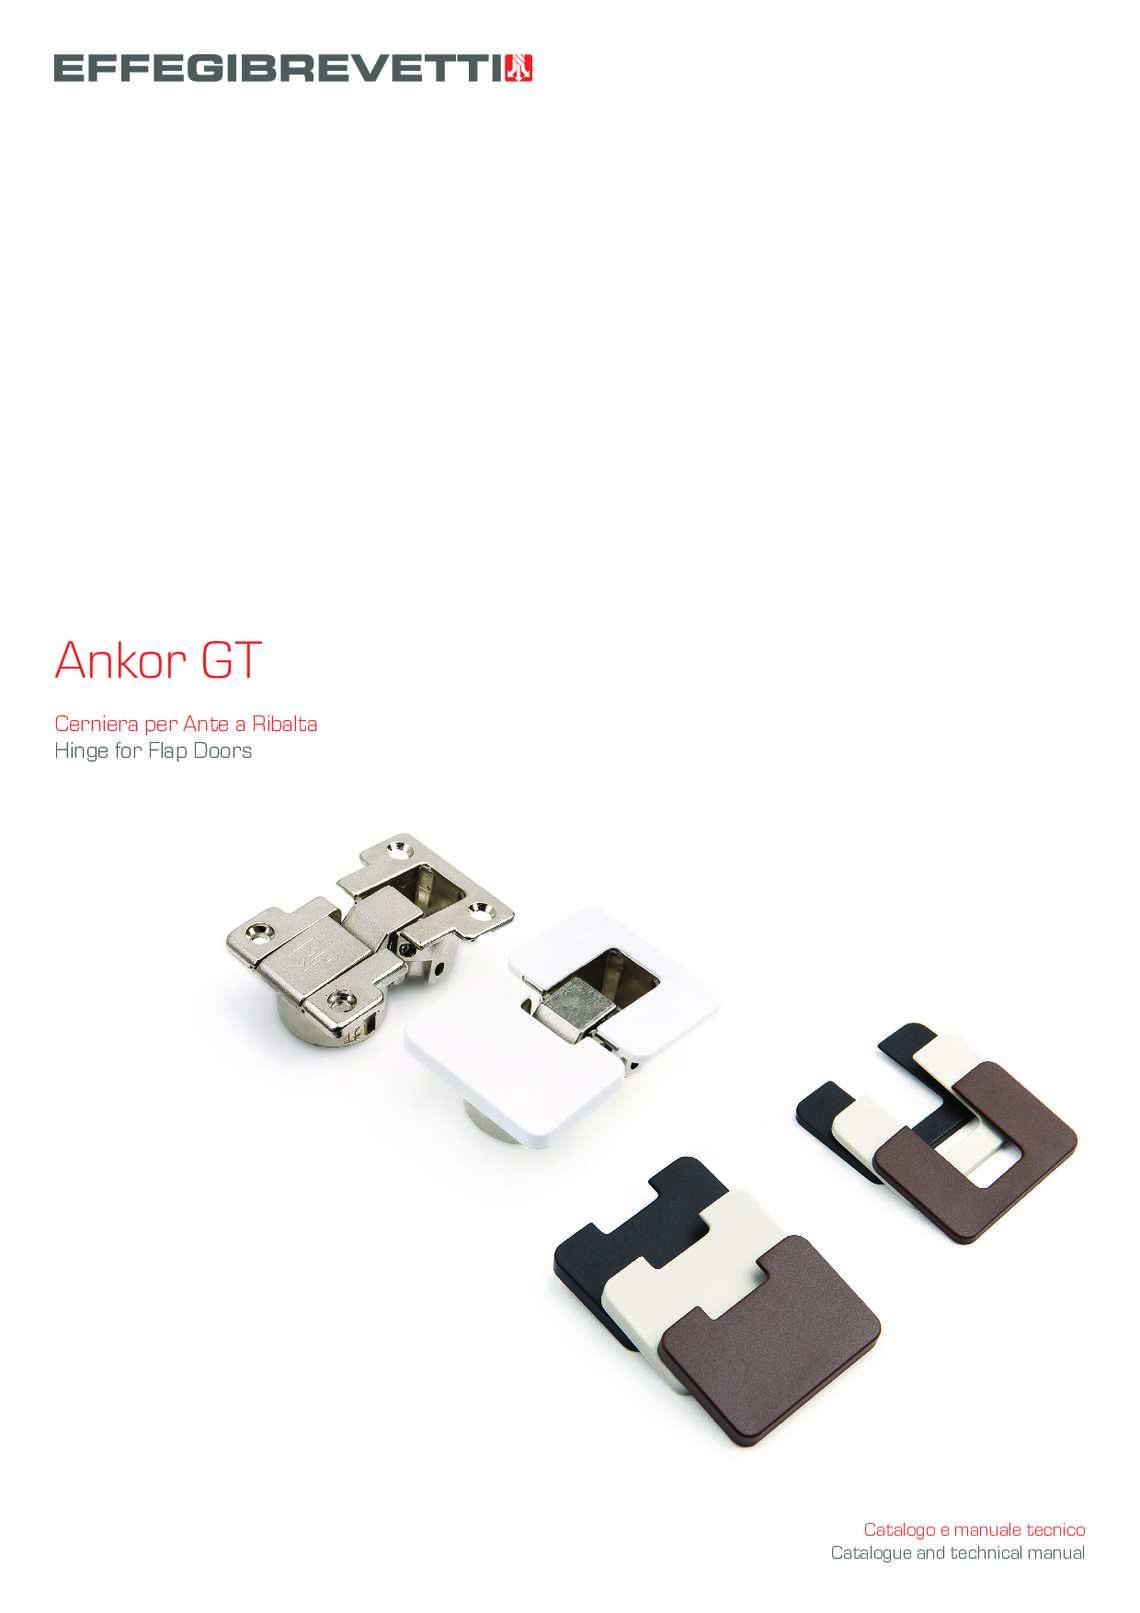 Ankor GT - Cerniera per Ante a Ribalta